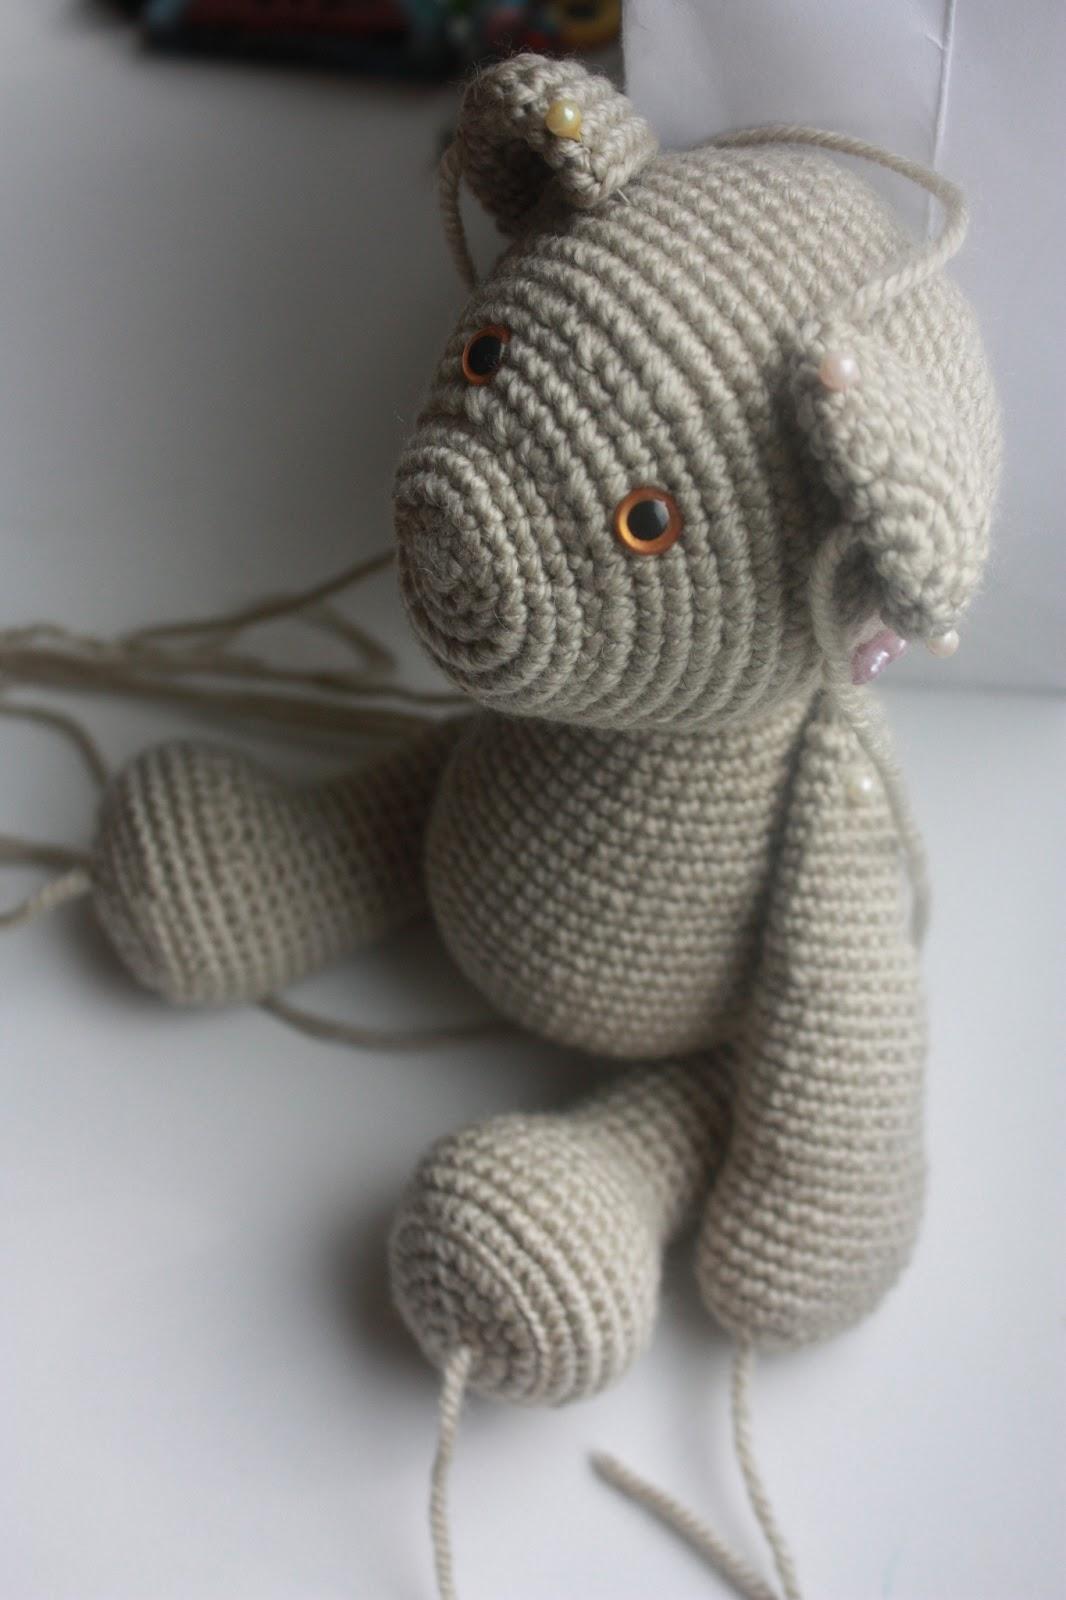 Big Teddy Bear Crochet Pattern Free : HAPPYAMIGURUMI: New Teddy Bear Pattern in process